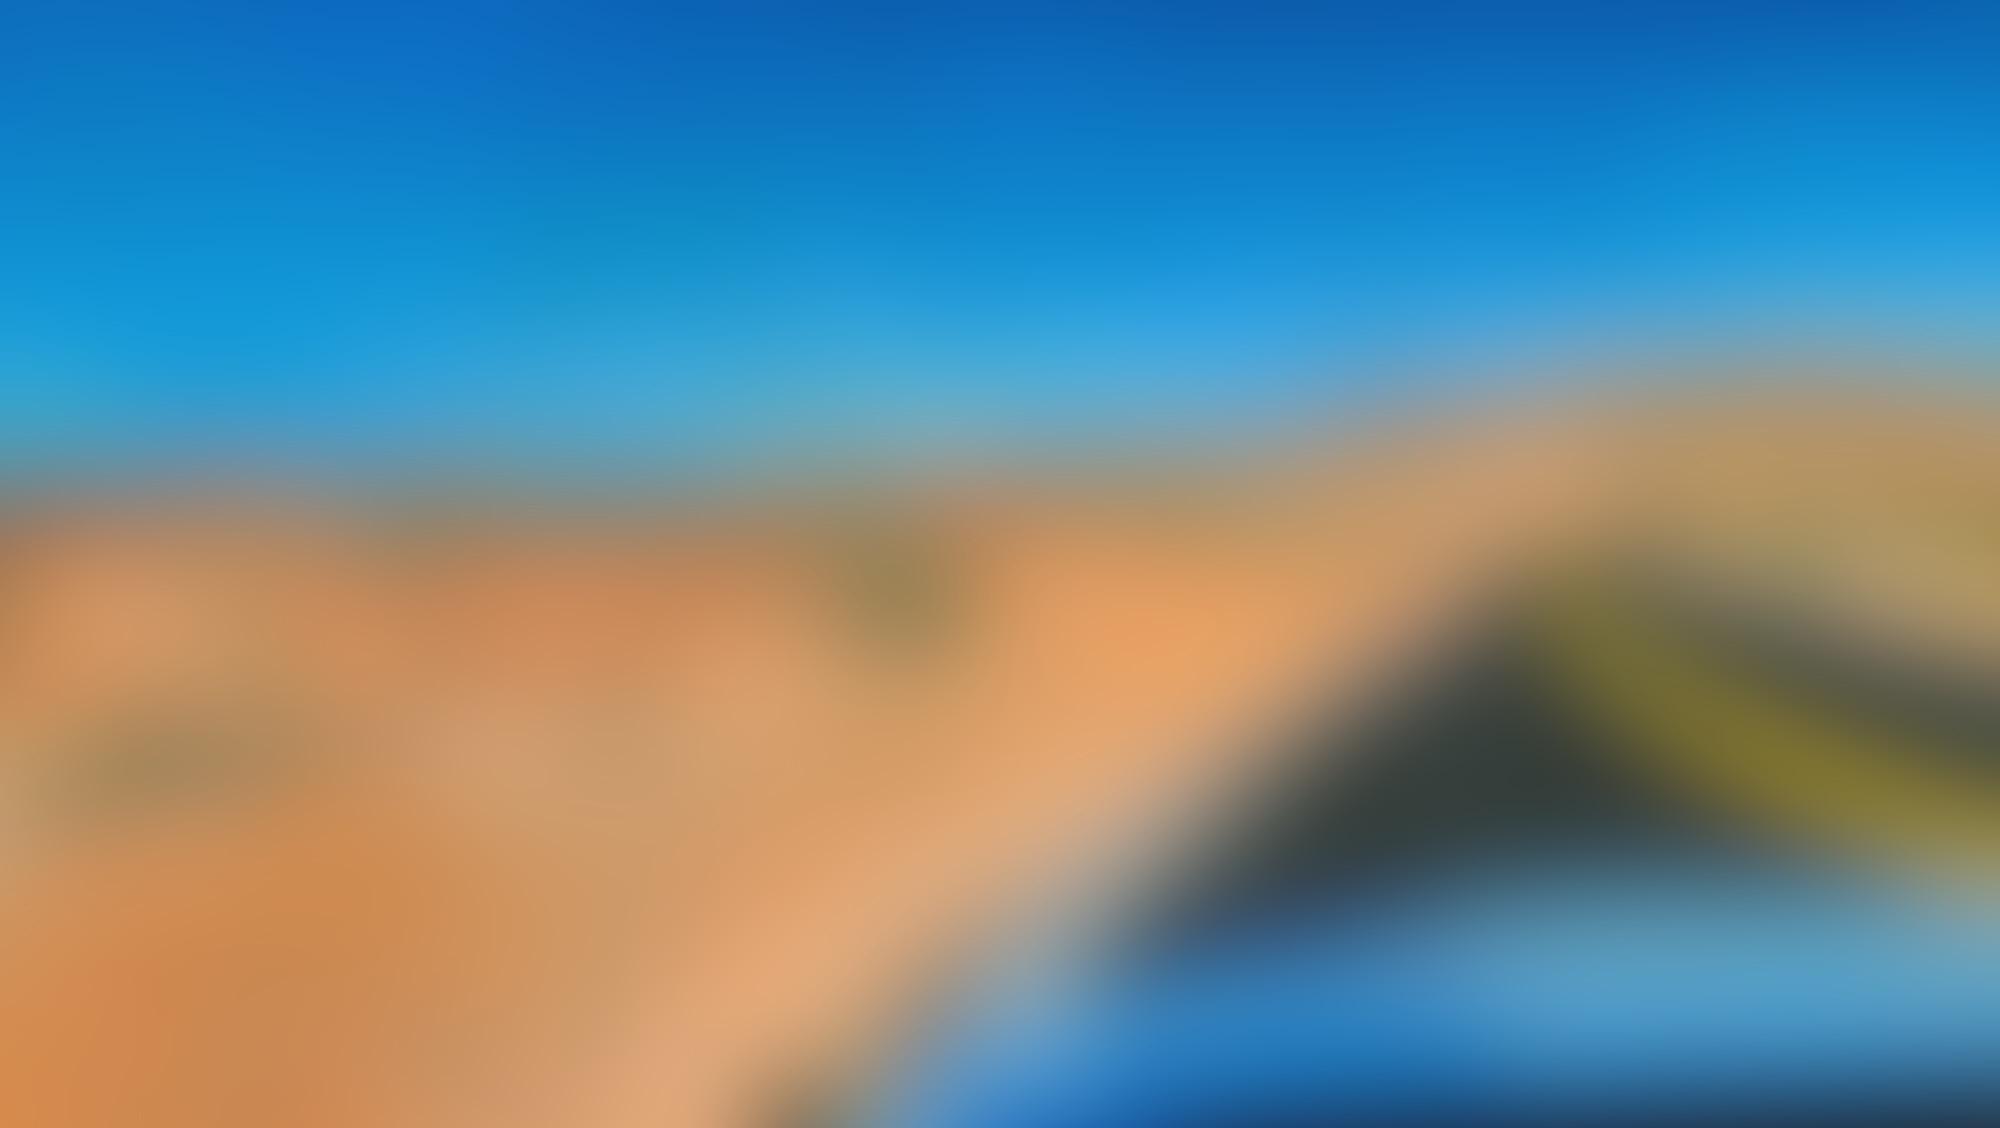 Alice tye illustration oil paints nevada drive 2015 usairl lectureinprogress 01 autocompressfitresizeixlibphp 1 1 0max h2000max w3 D2000q80s957d01007fdd80948640e15c1468981a